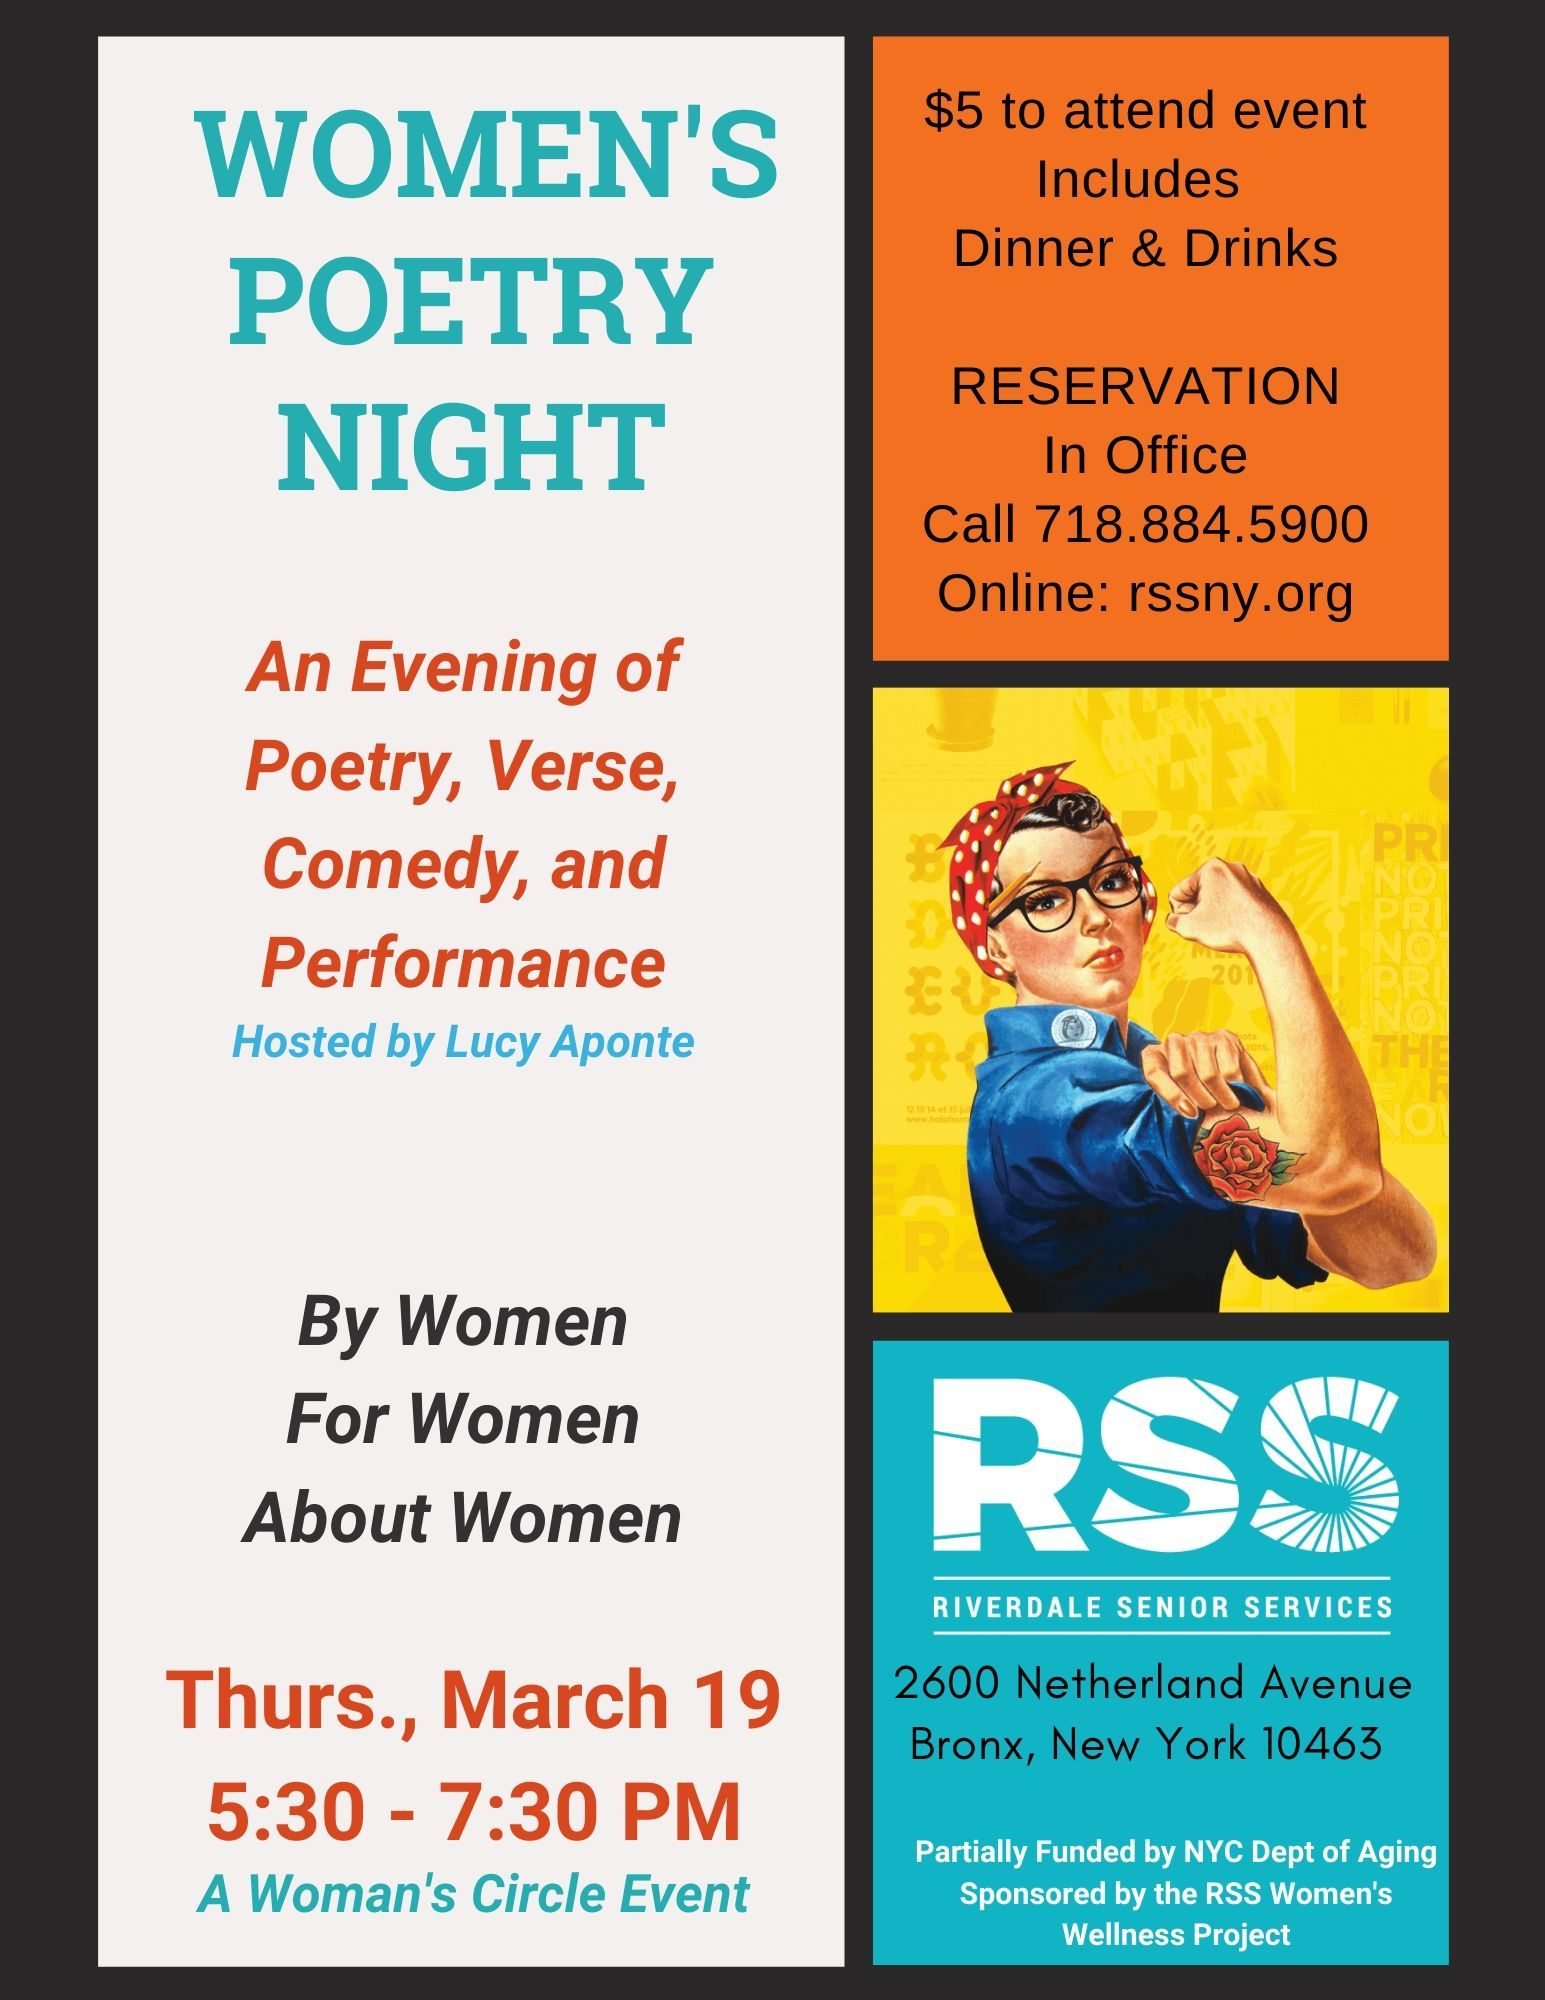 Women's Poetry Night